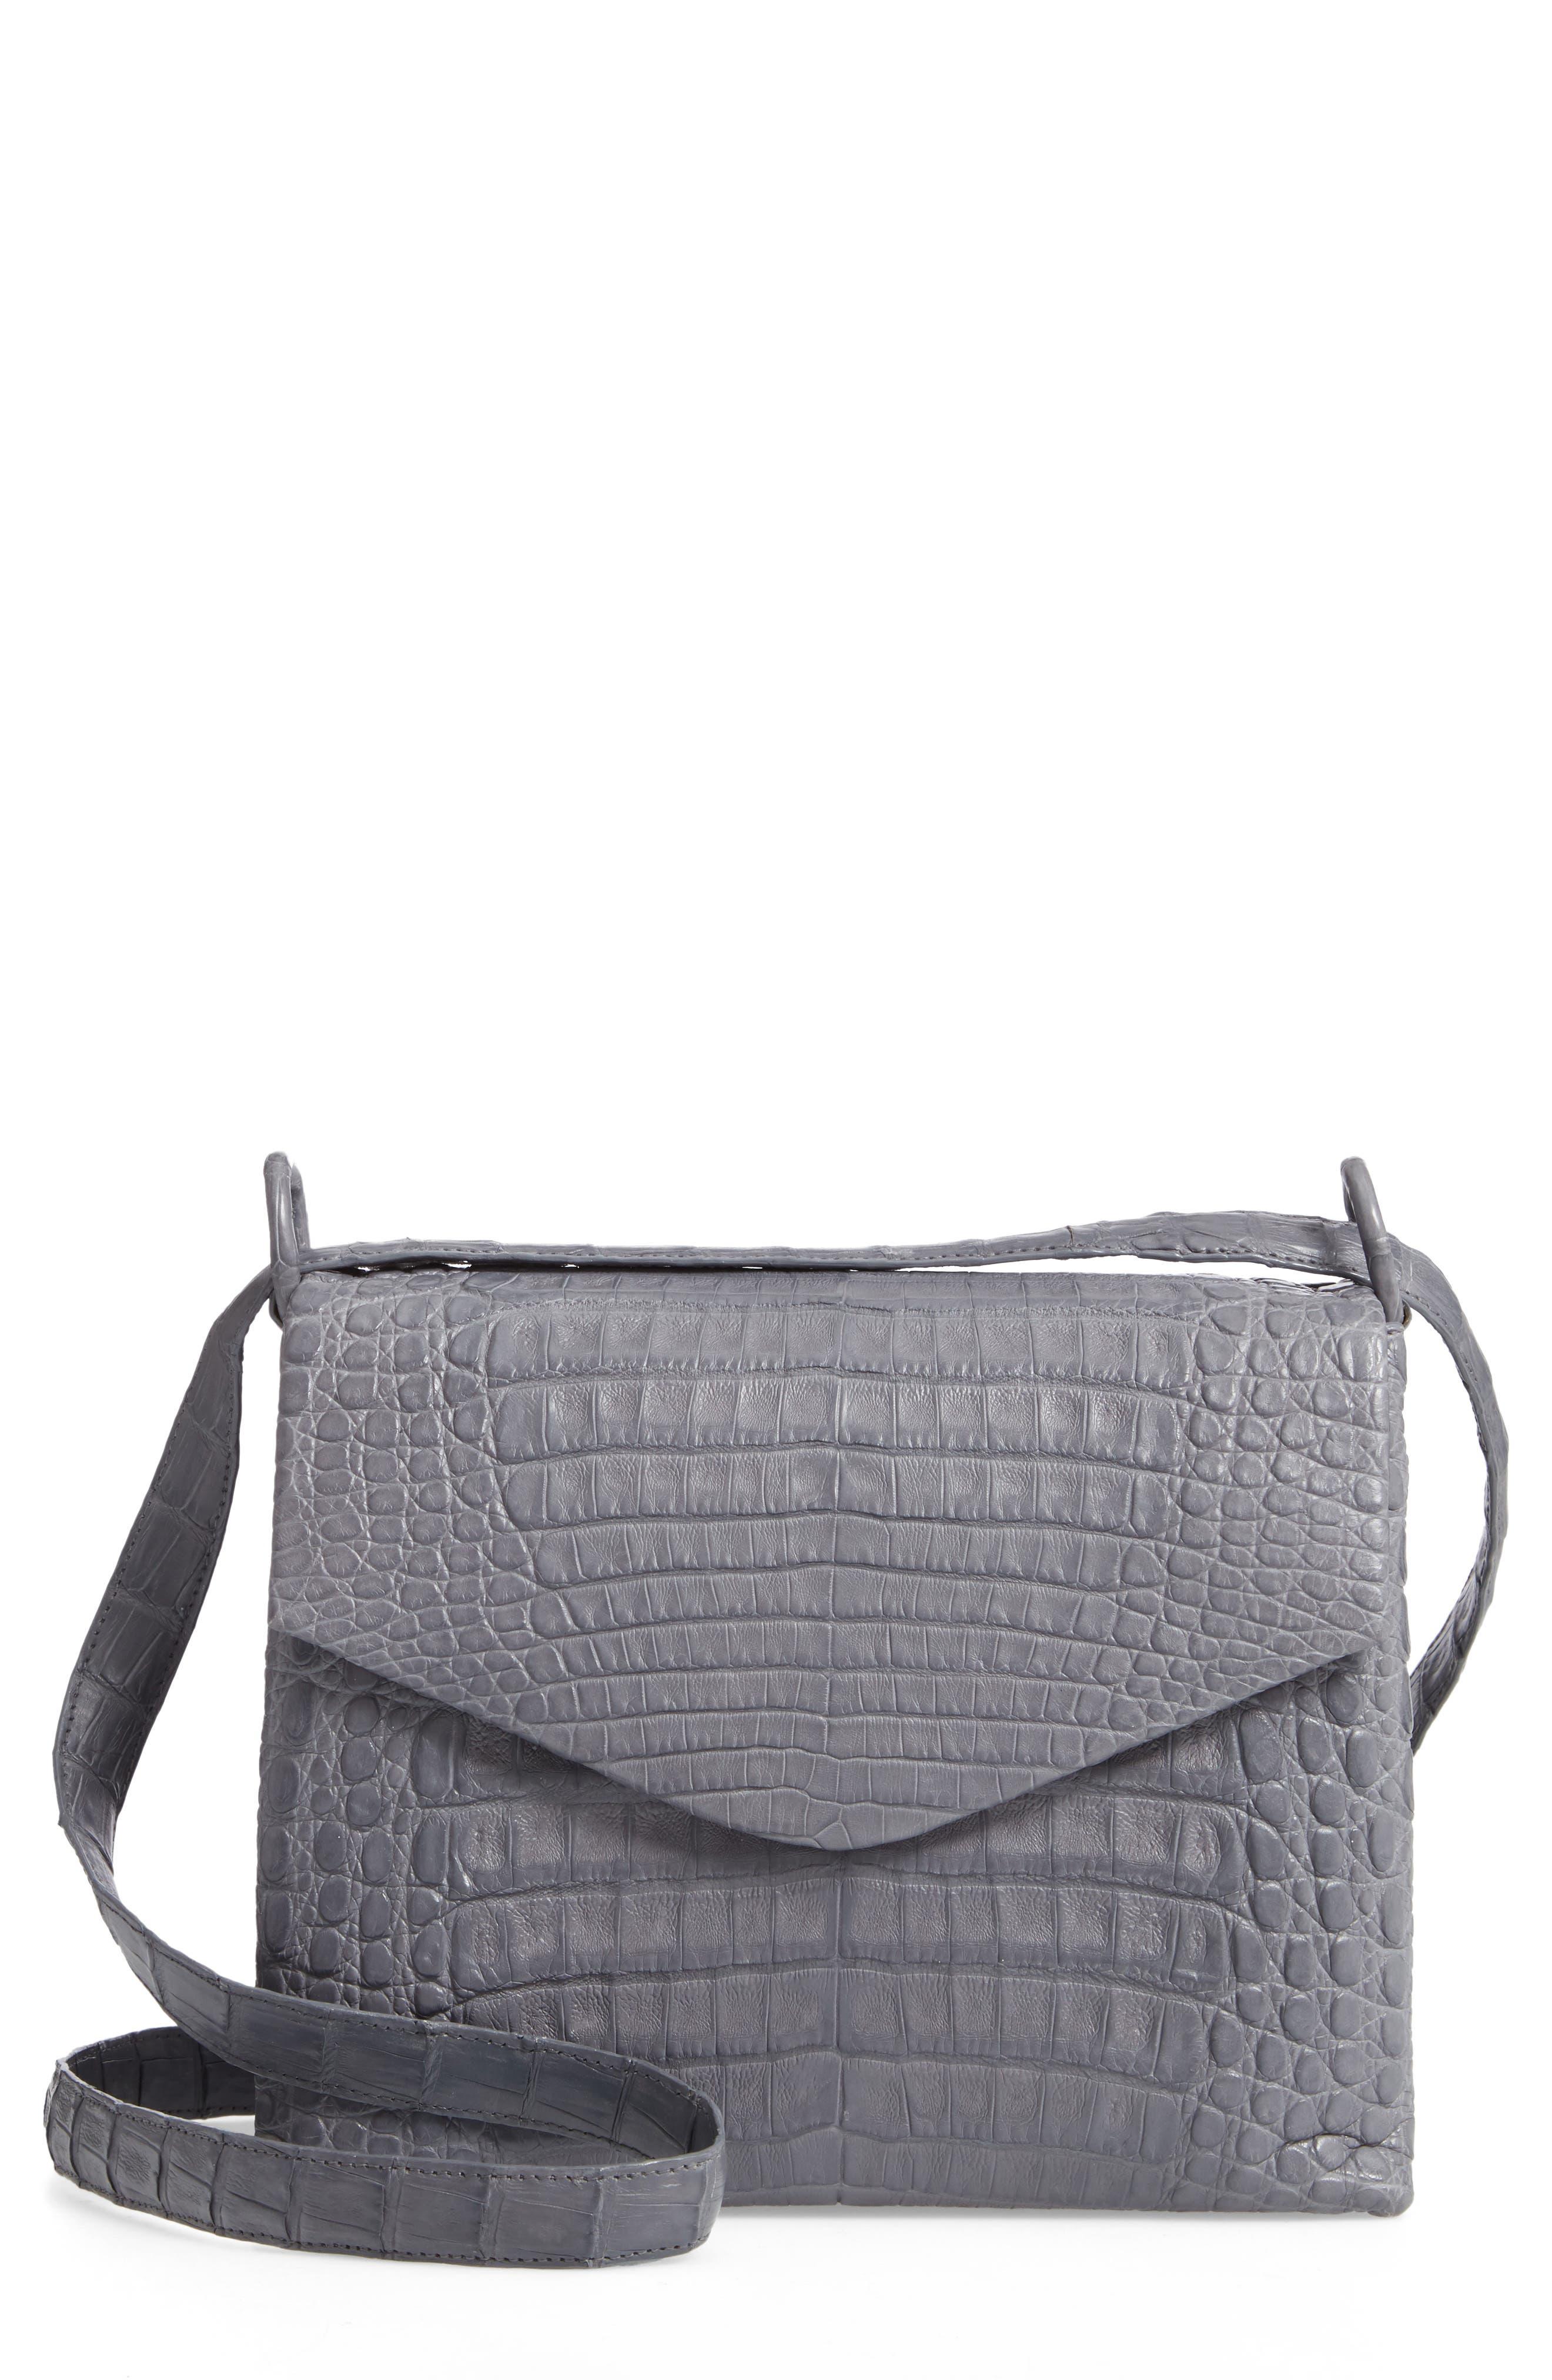 Medium Astor Crossbody Genuine Crocodile Bag - Grey in Grey Matte